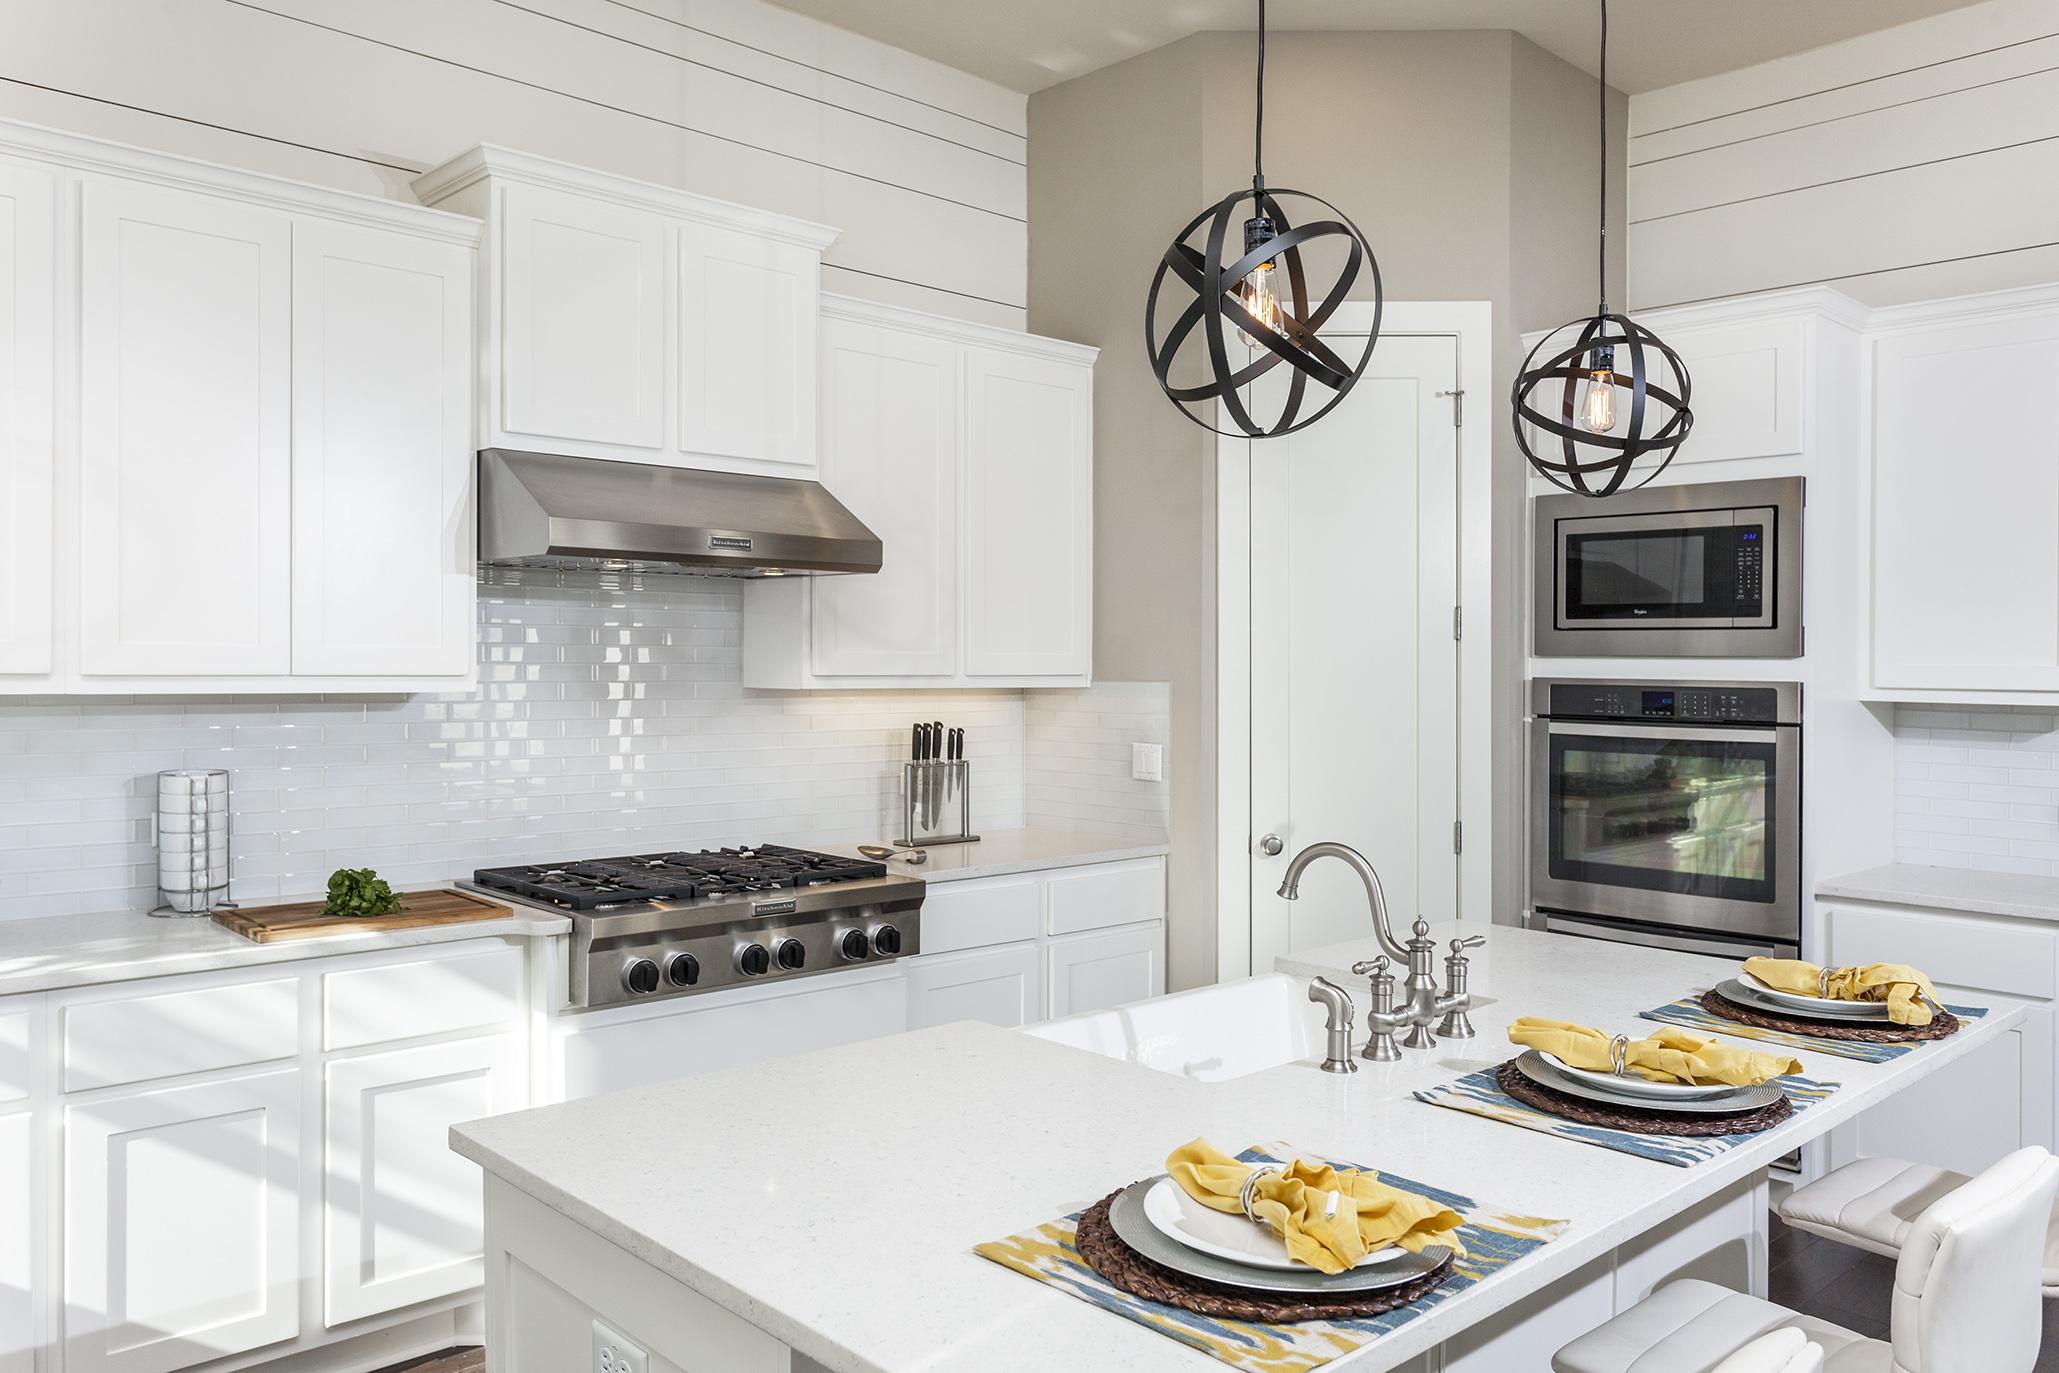 Cerulean Concepts Kitchen